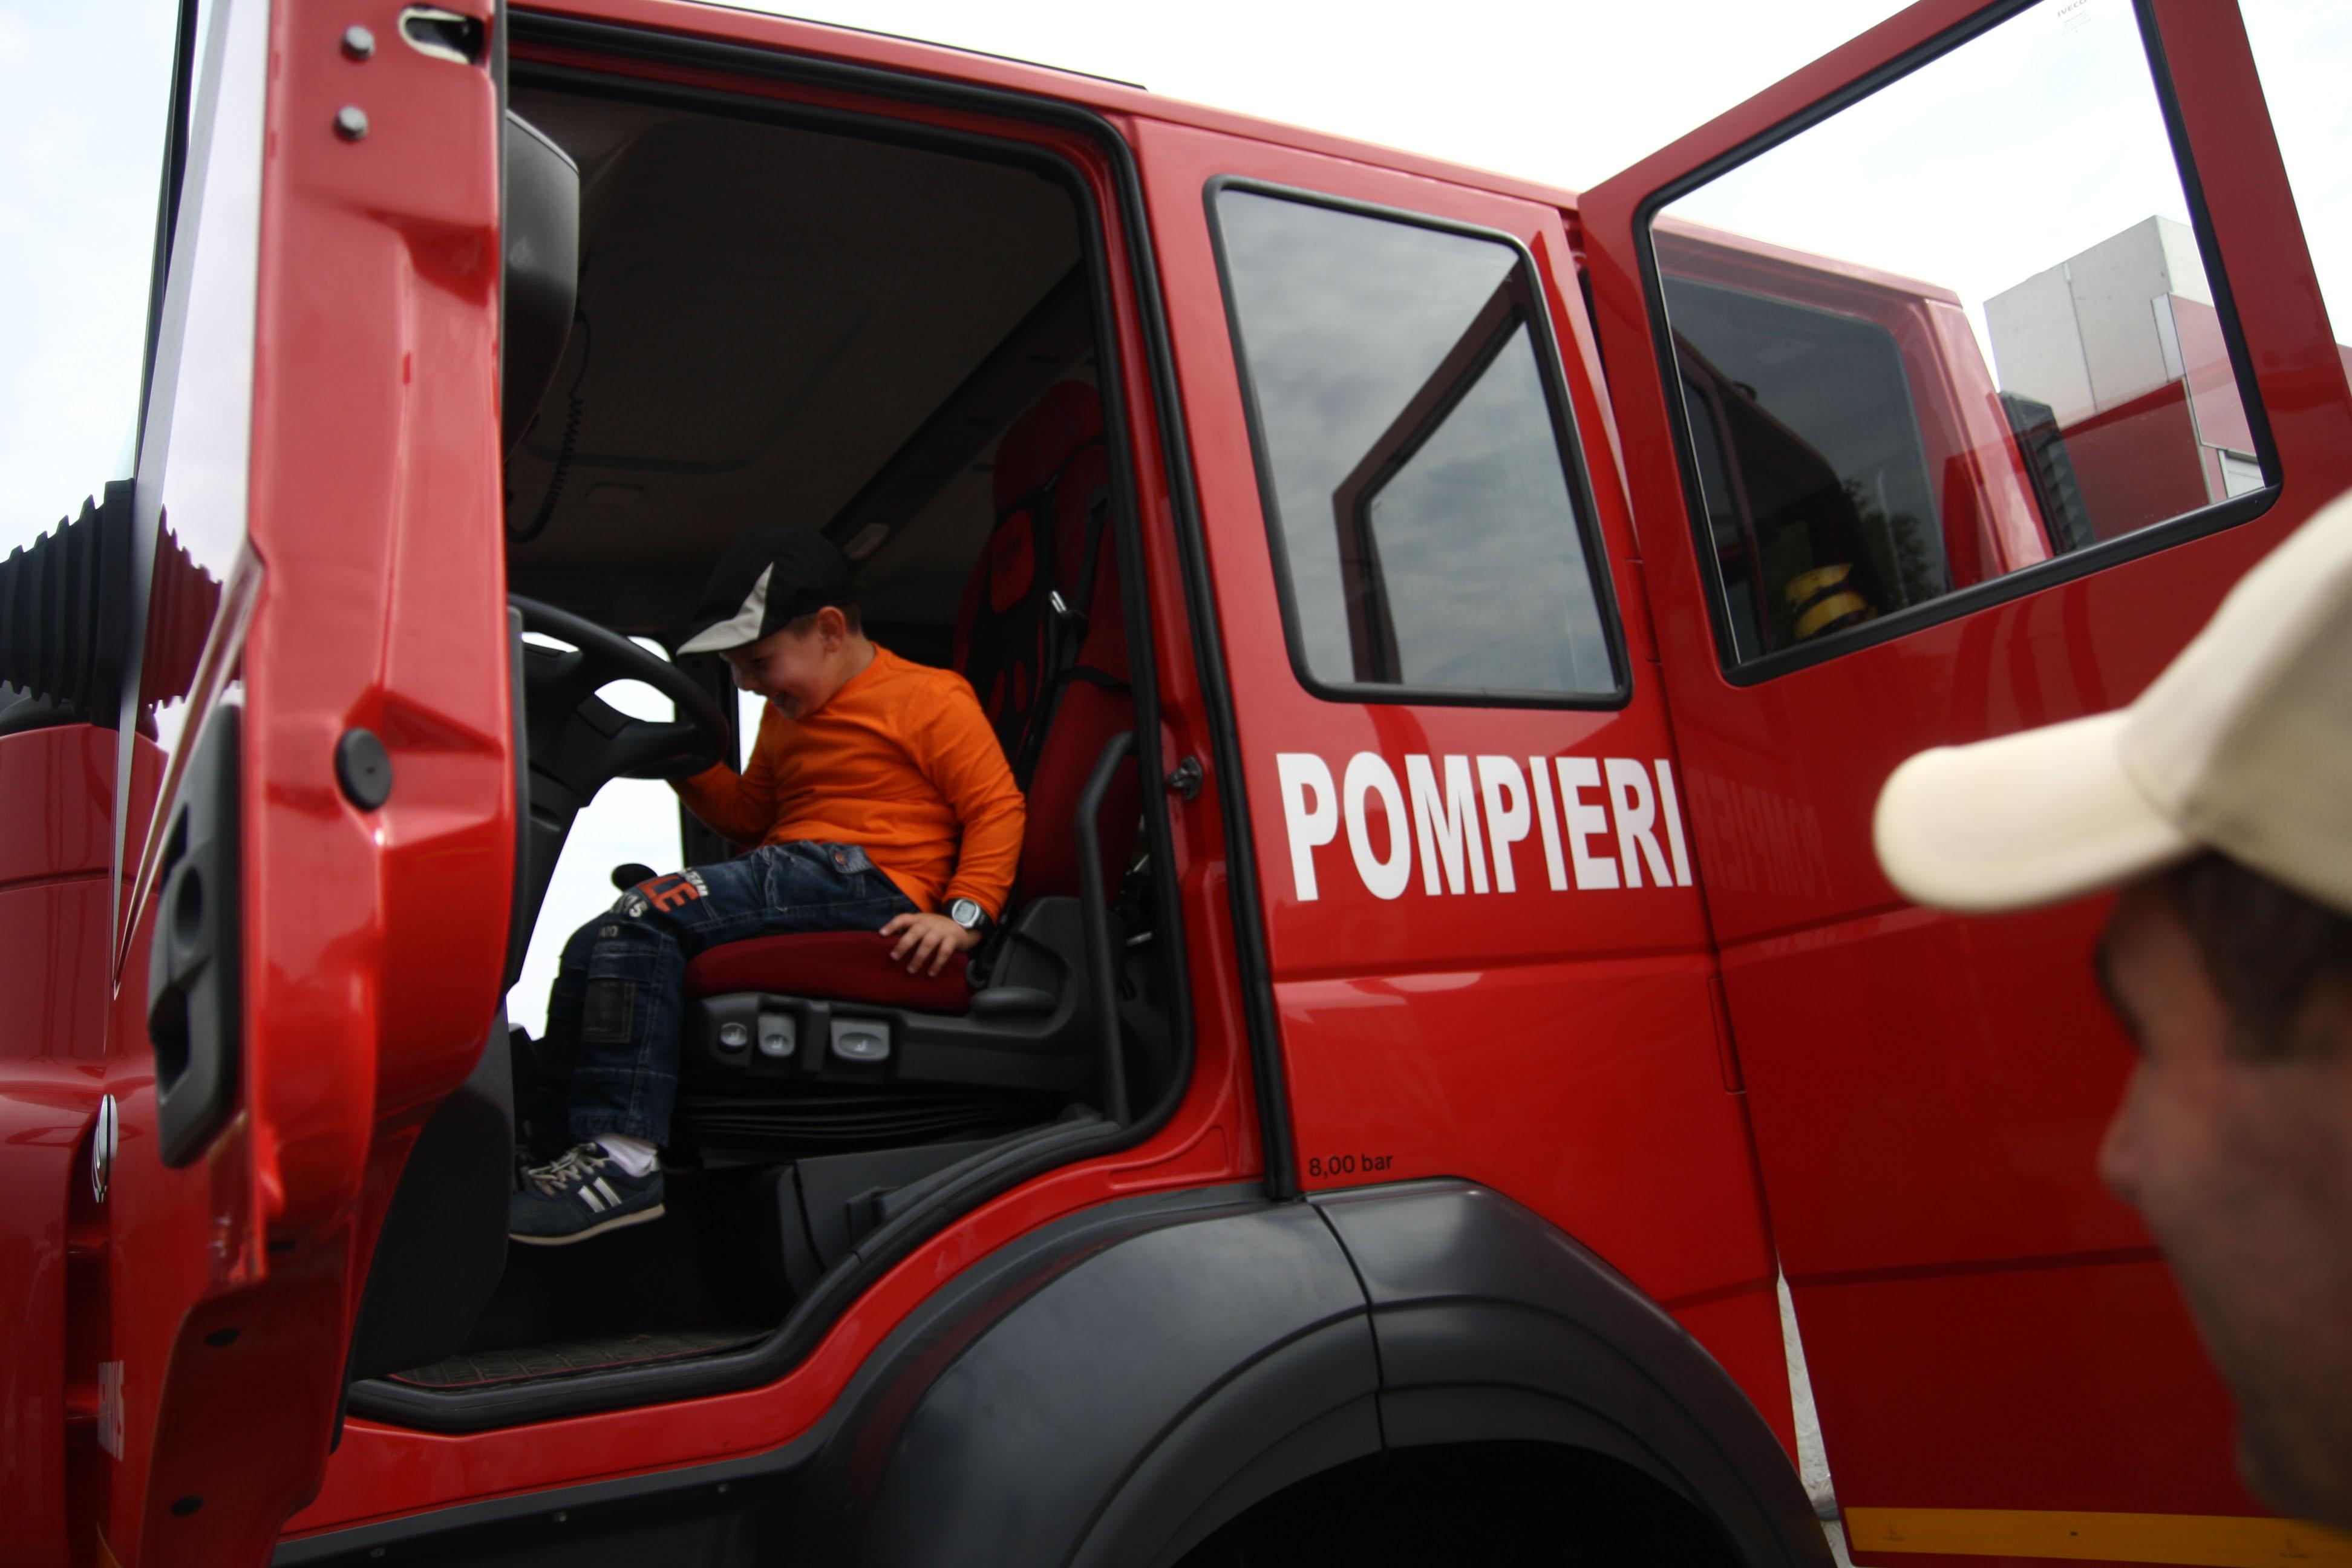 Masina de pompieri implicata intr-un accident din cauza unei soferite